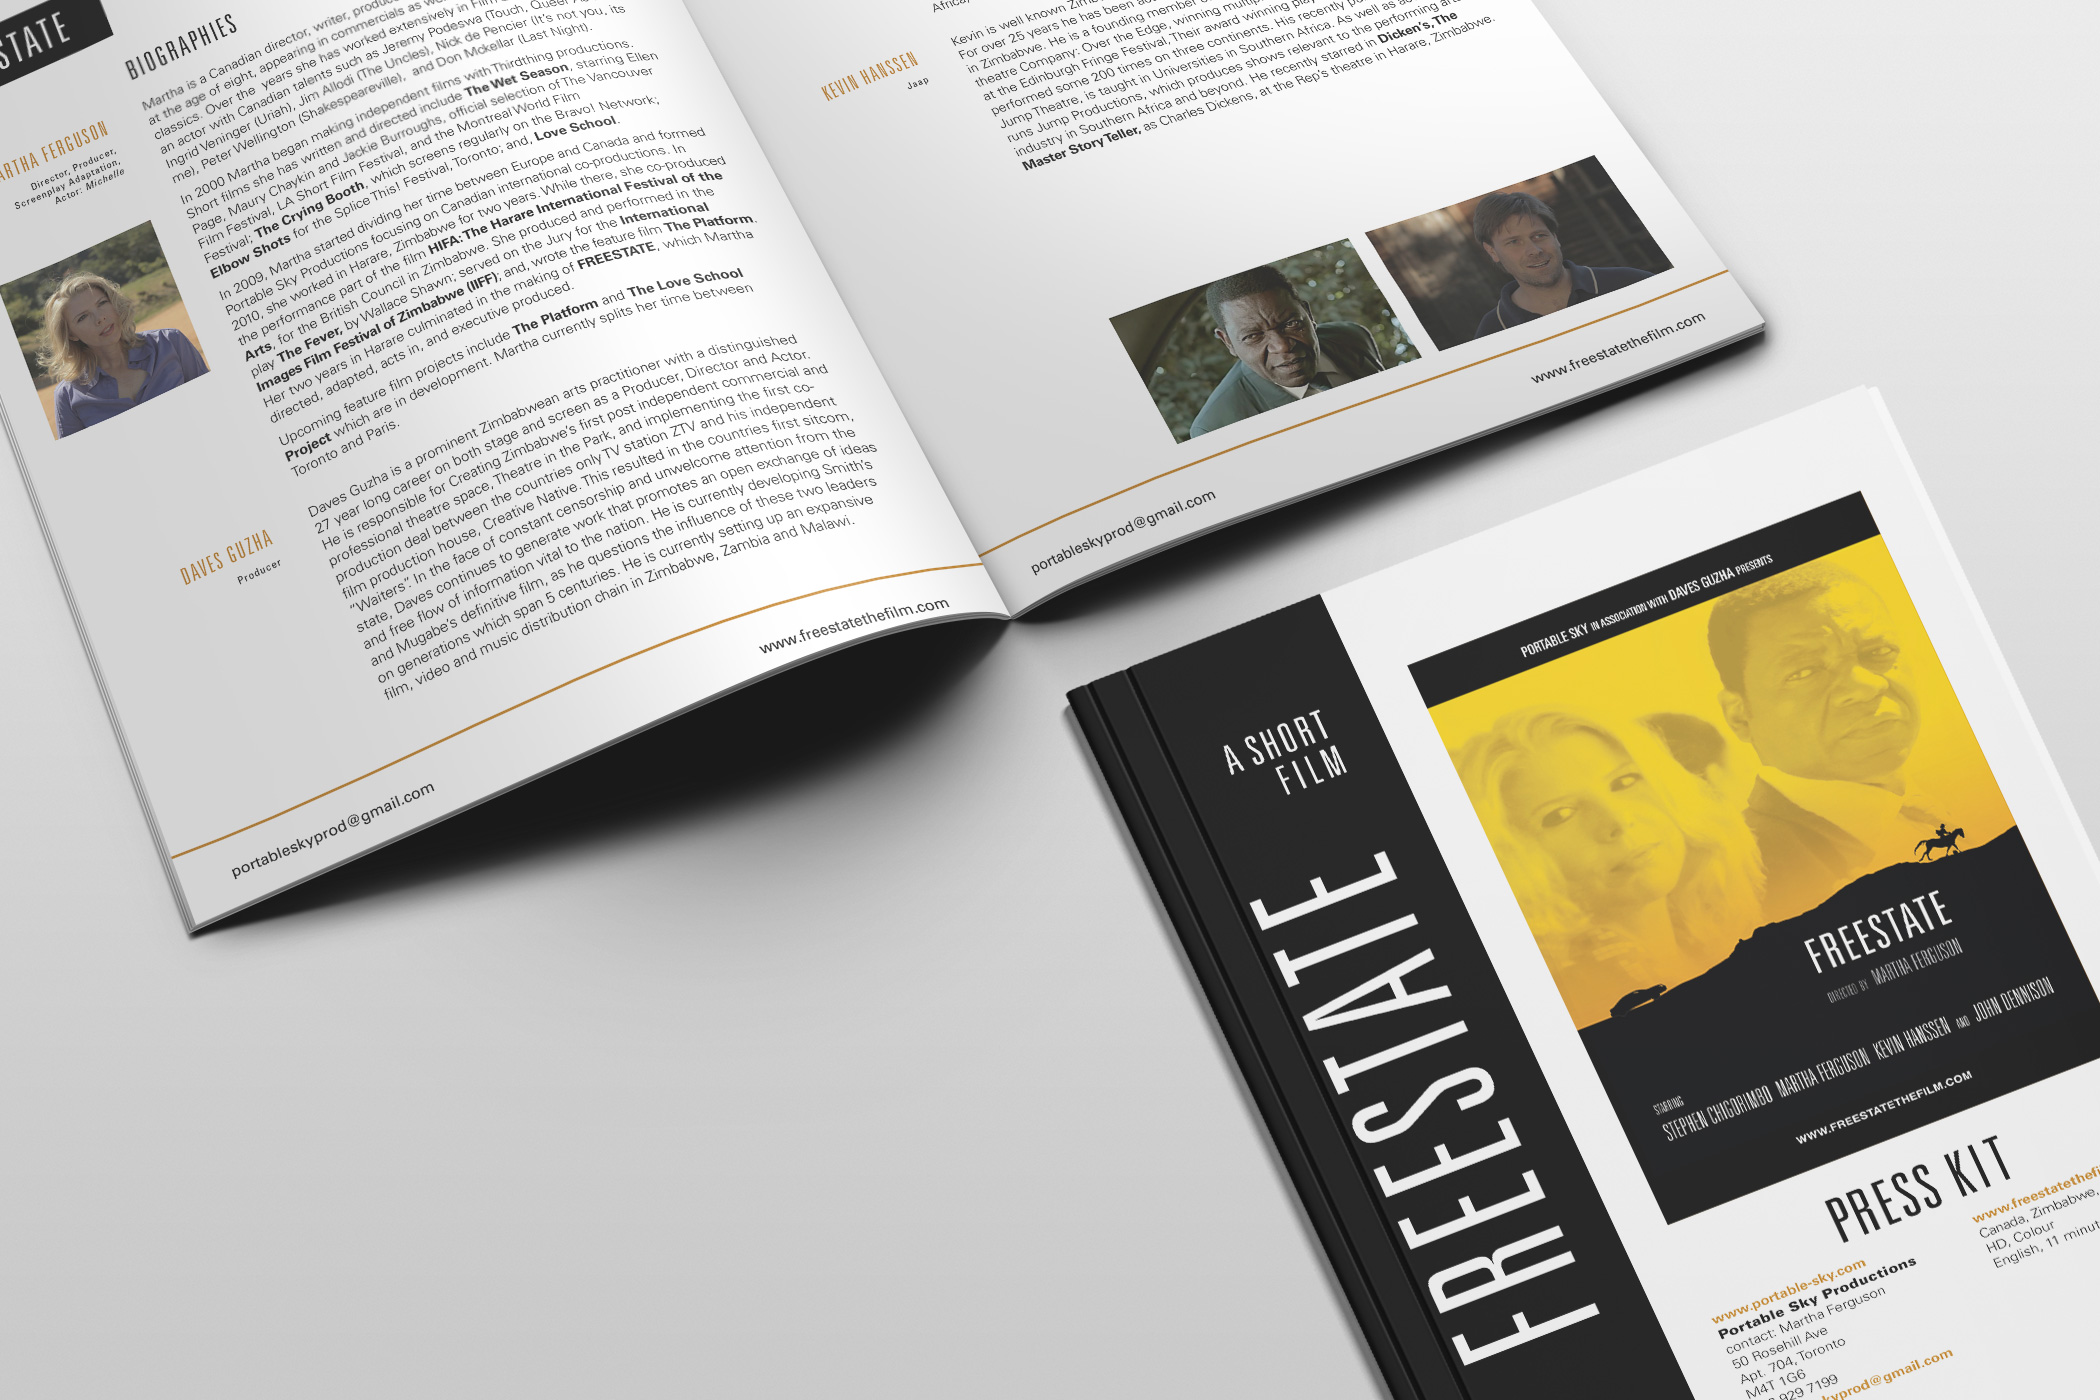 Press kit for Freestate, a short film